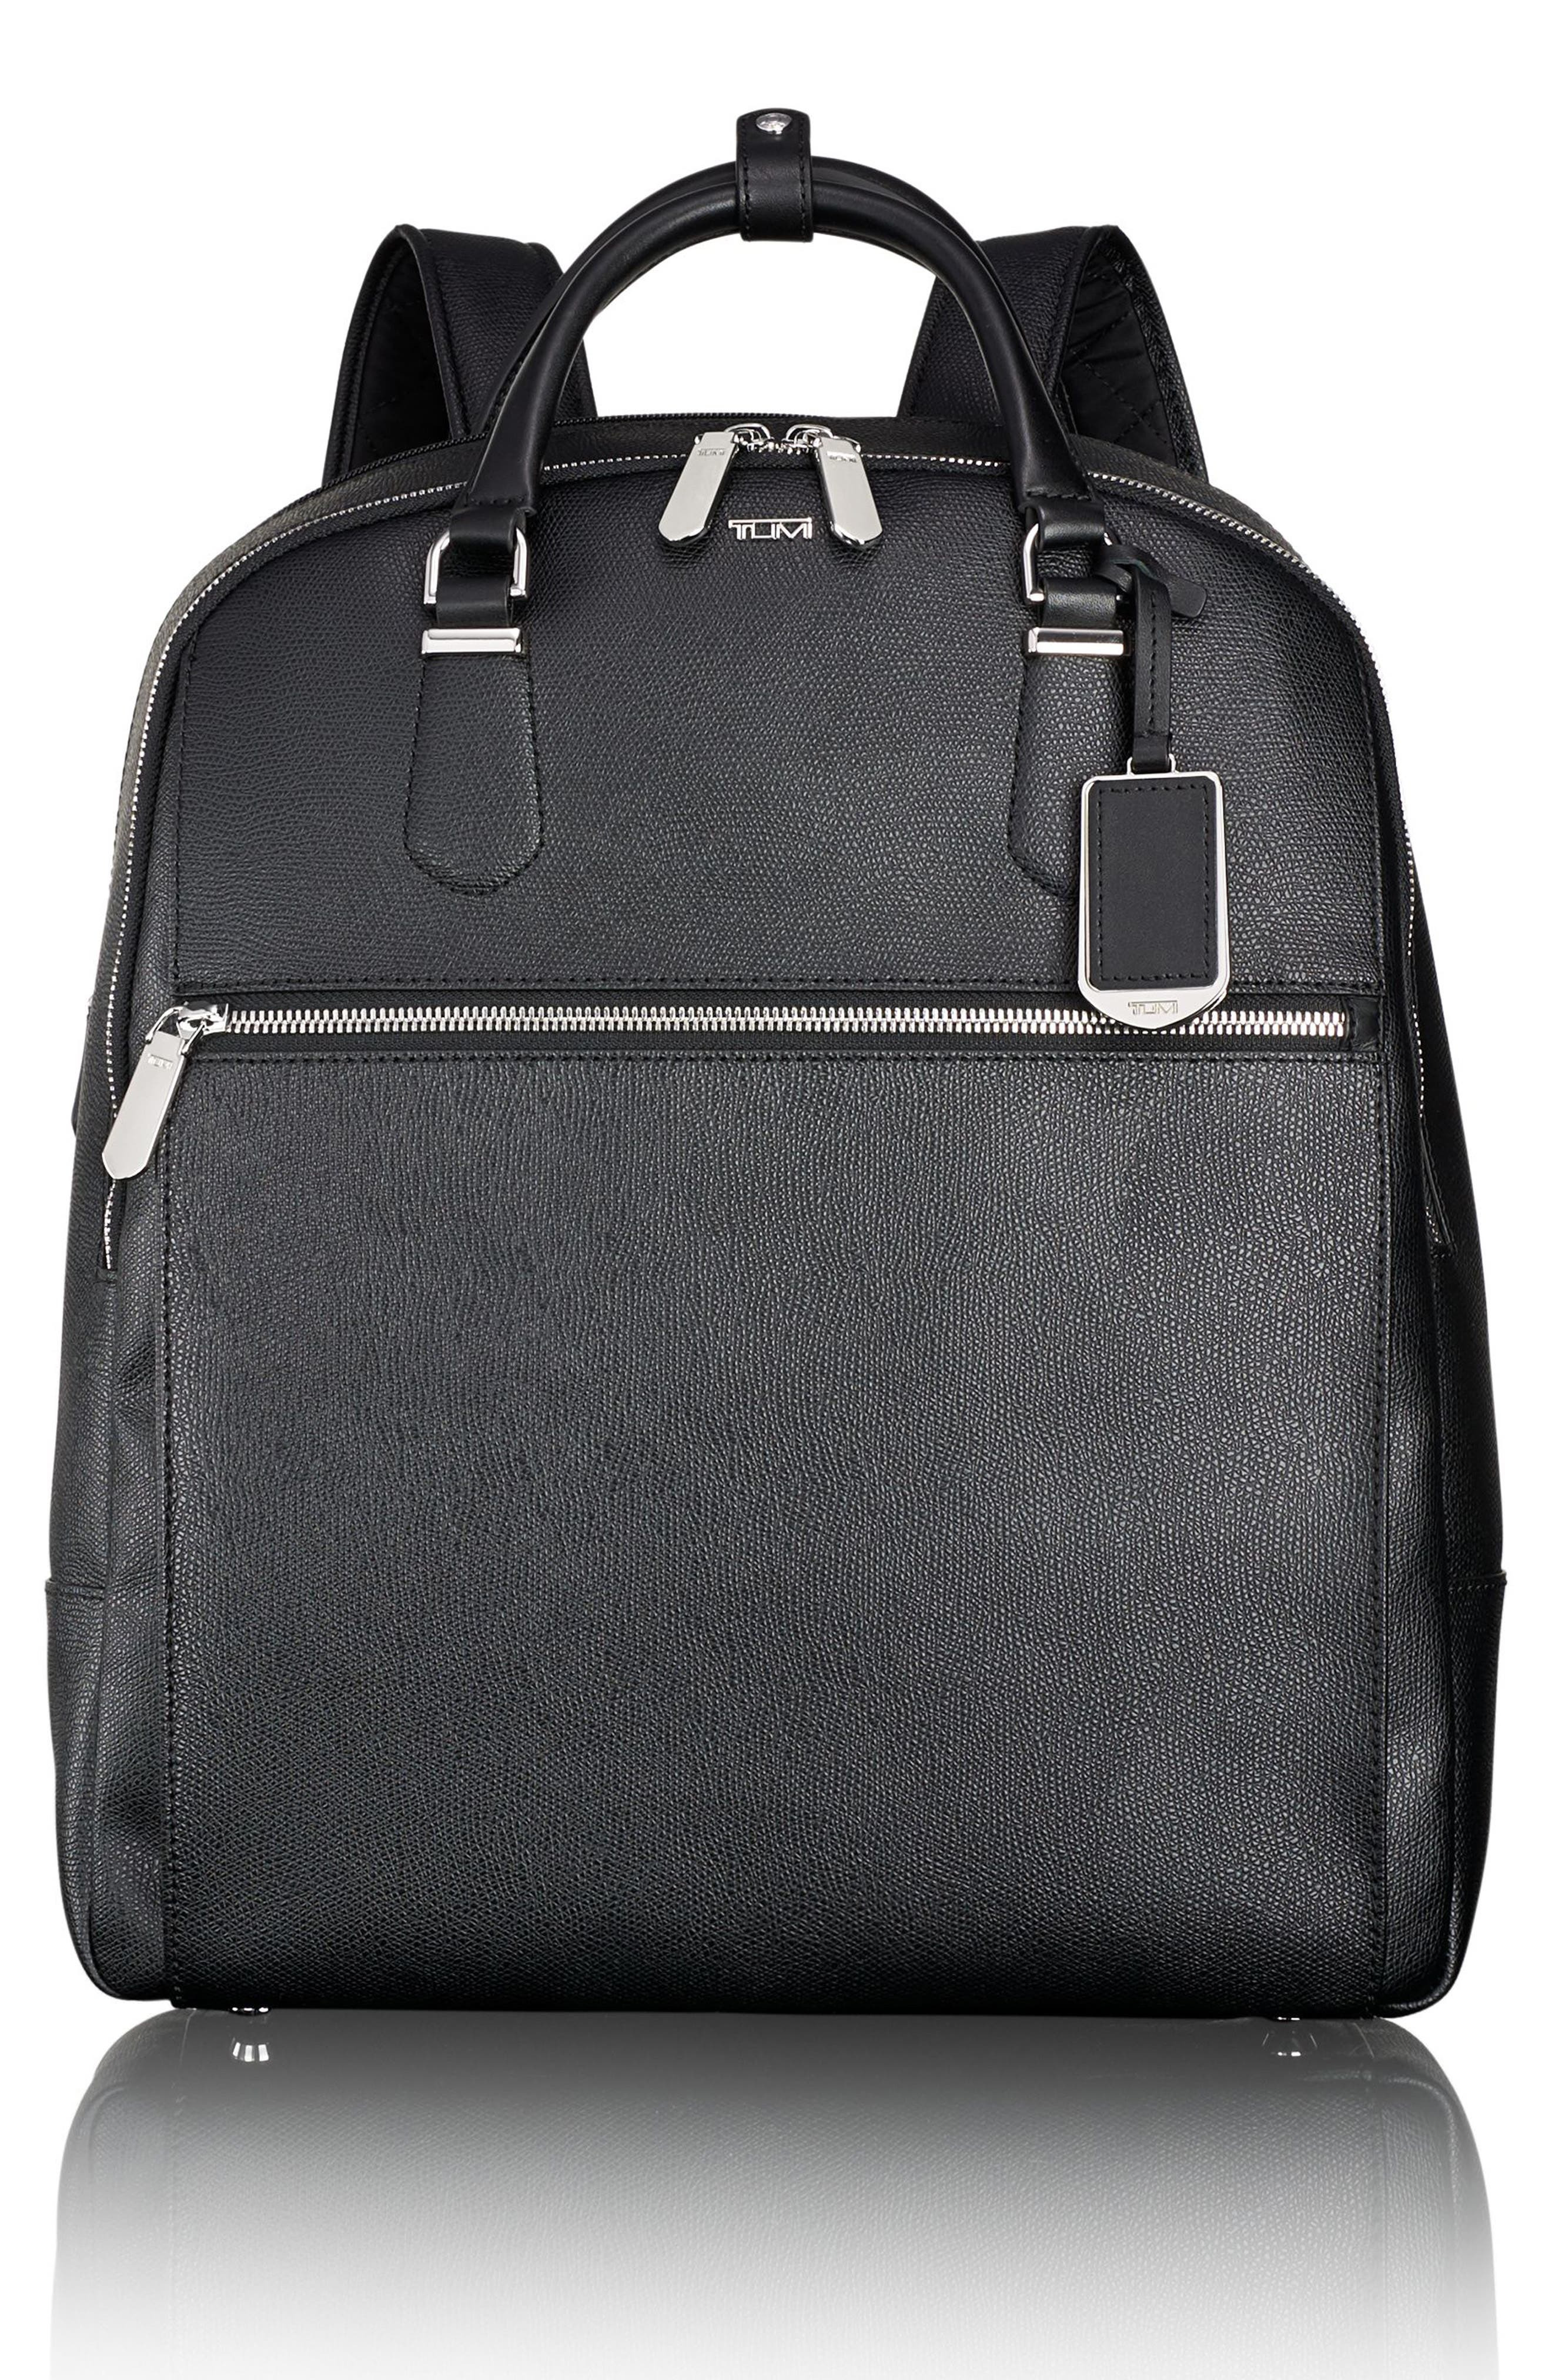 Odel Convertible Backpack,                             Main thumbnail 1, color,